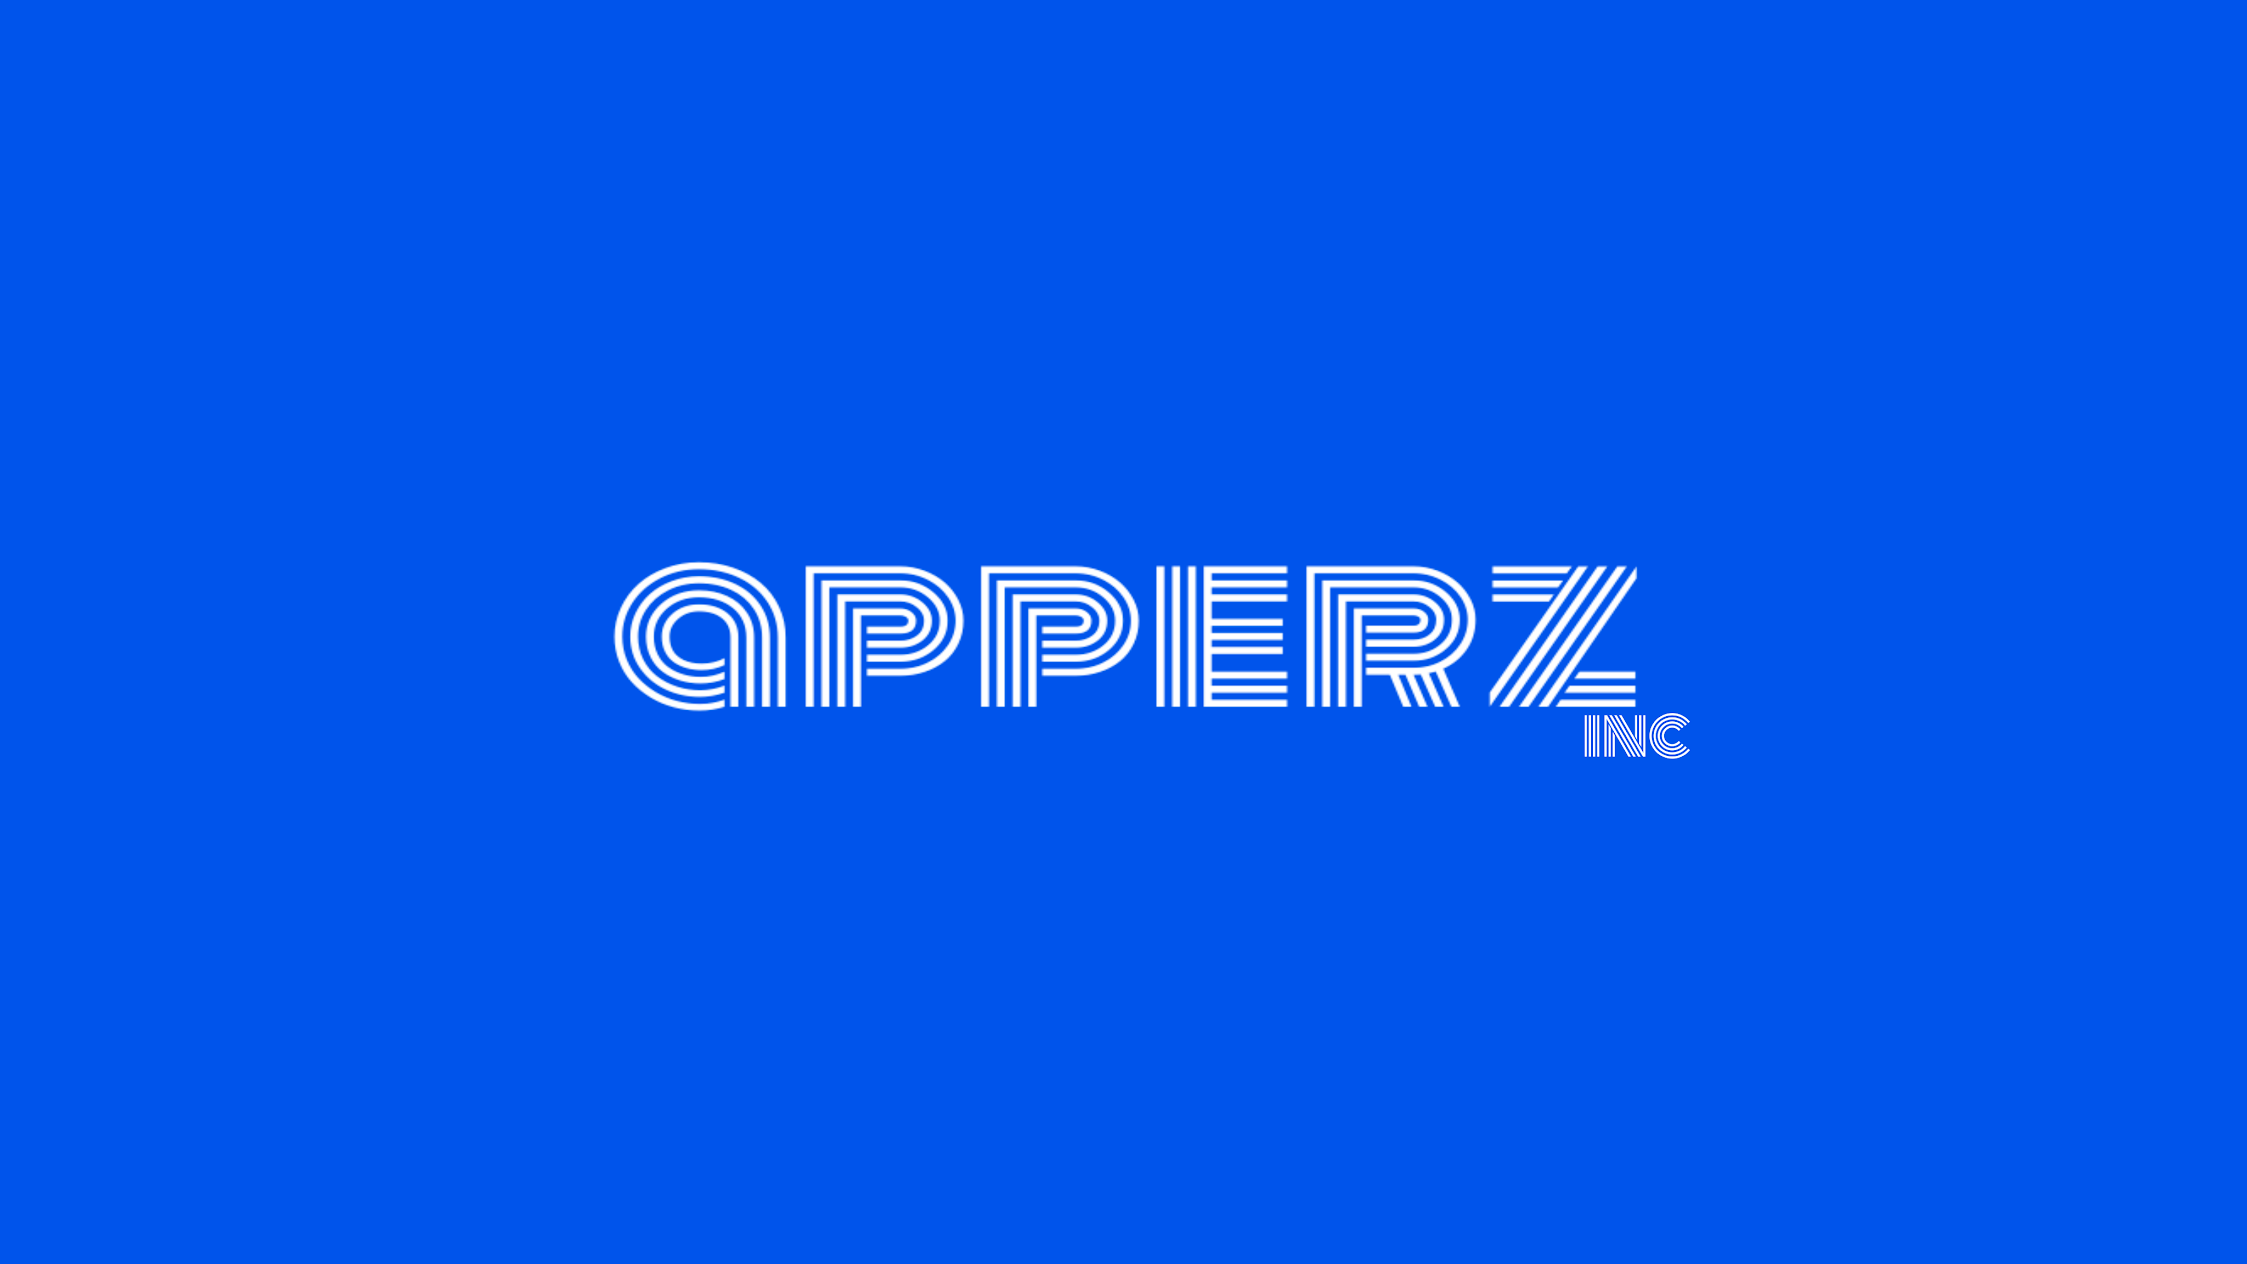 Apperz Inc